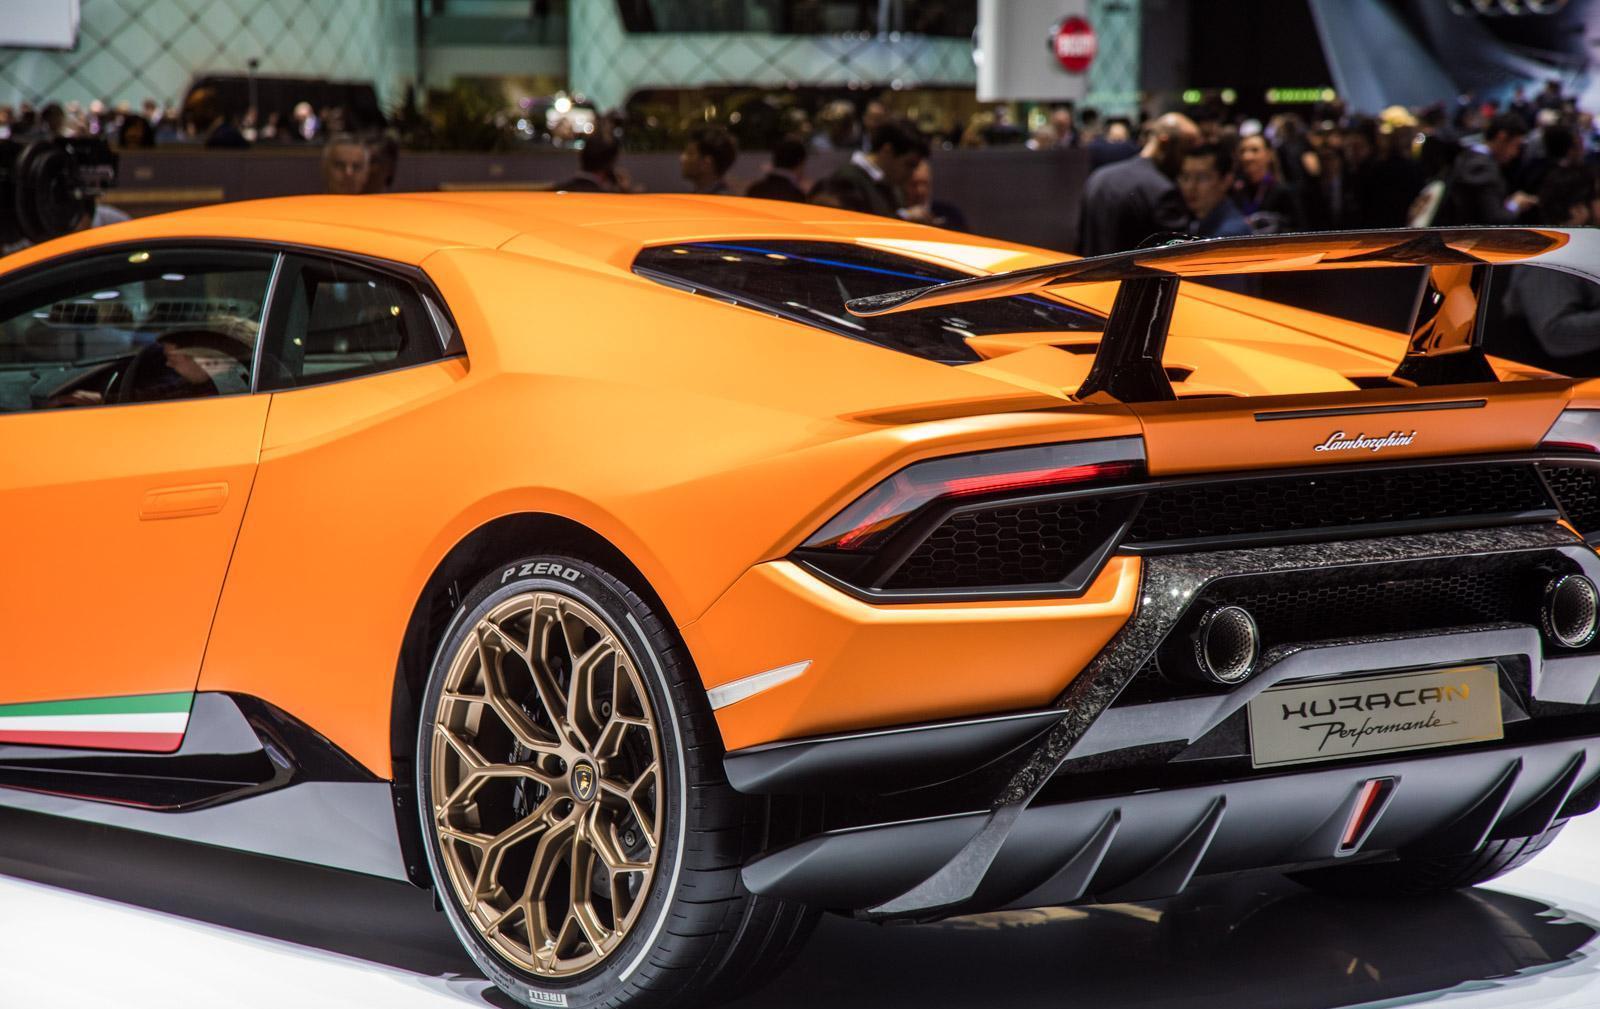 Lamborghini-Huracan-Performante-011